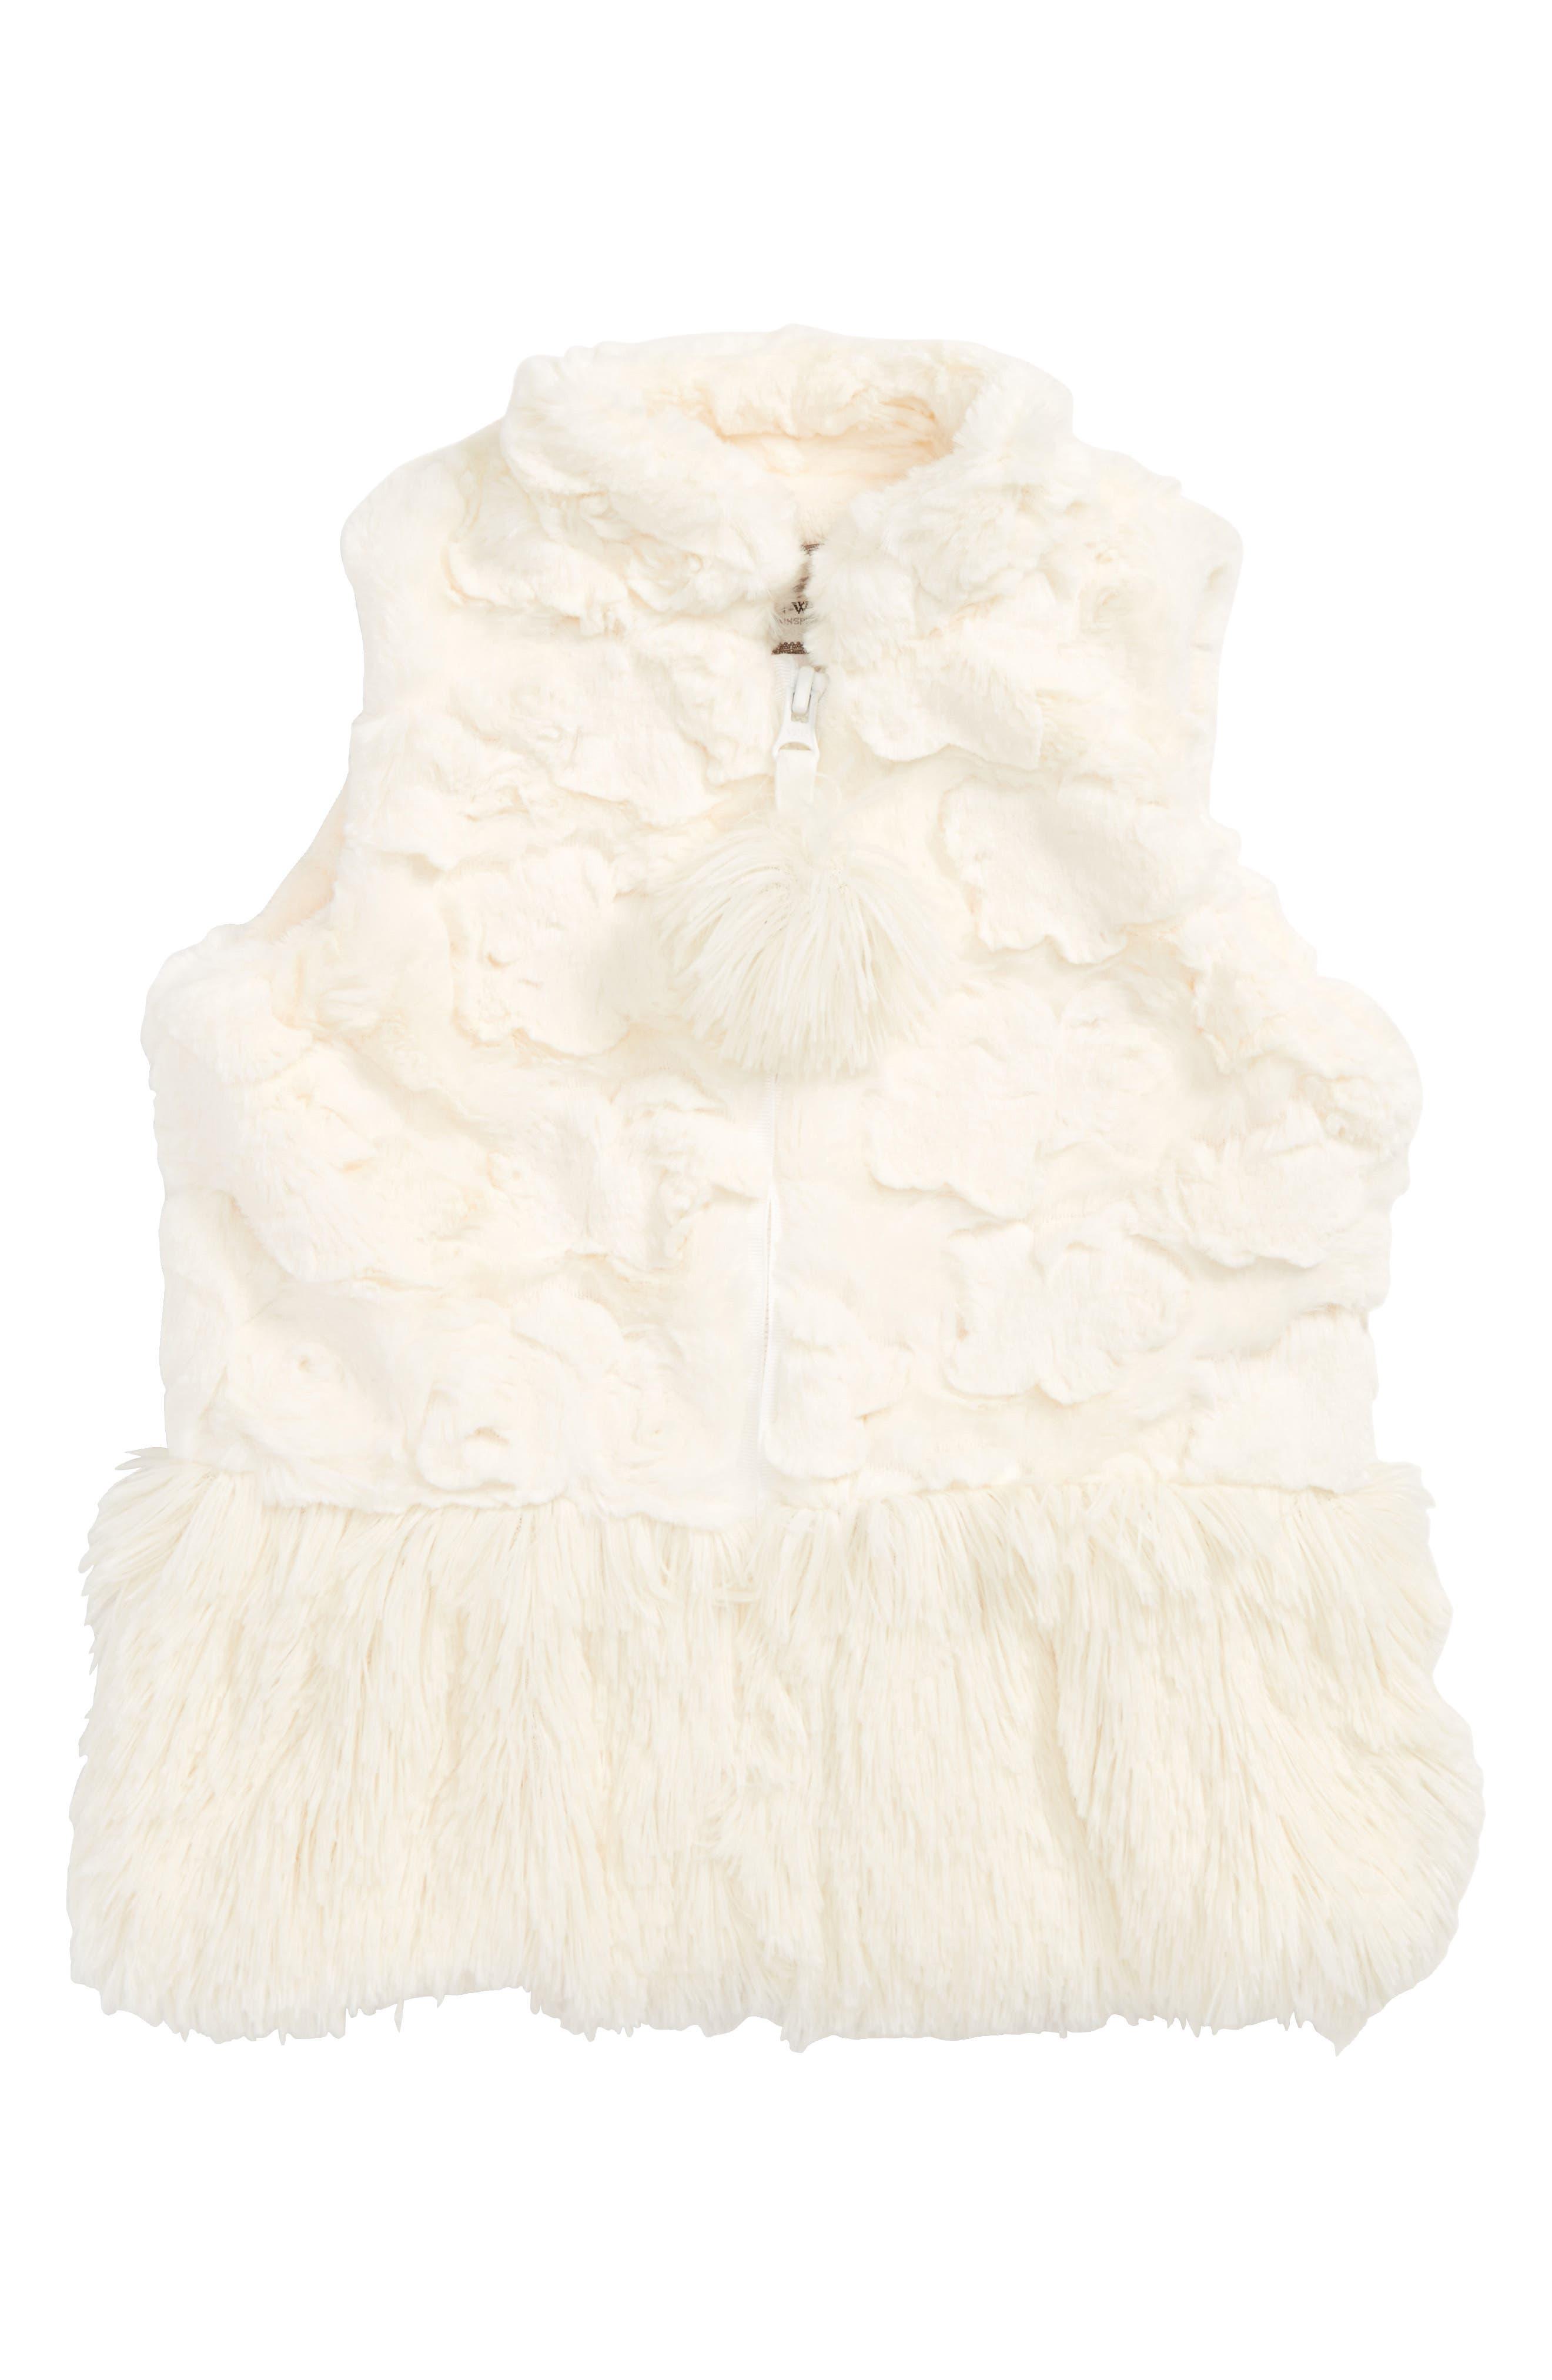 Alternate Image 1 Selected - Widgeon Faux Fur Peplum Vest (Toddler Girls & Little Girls)